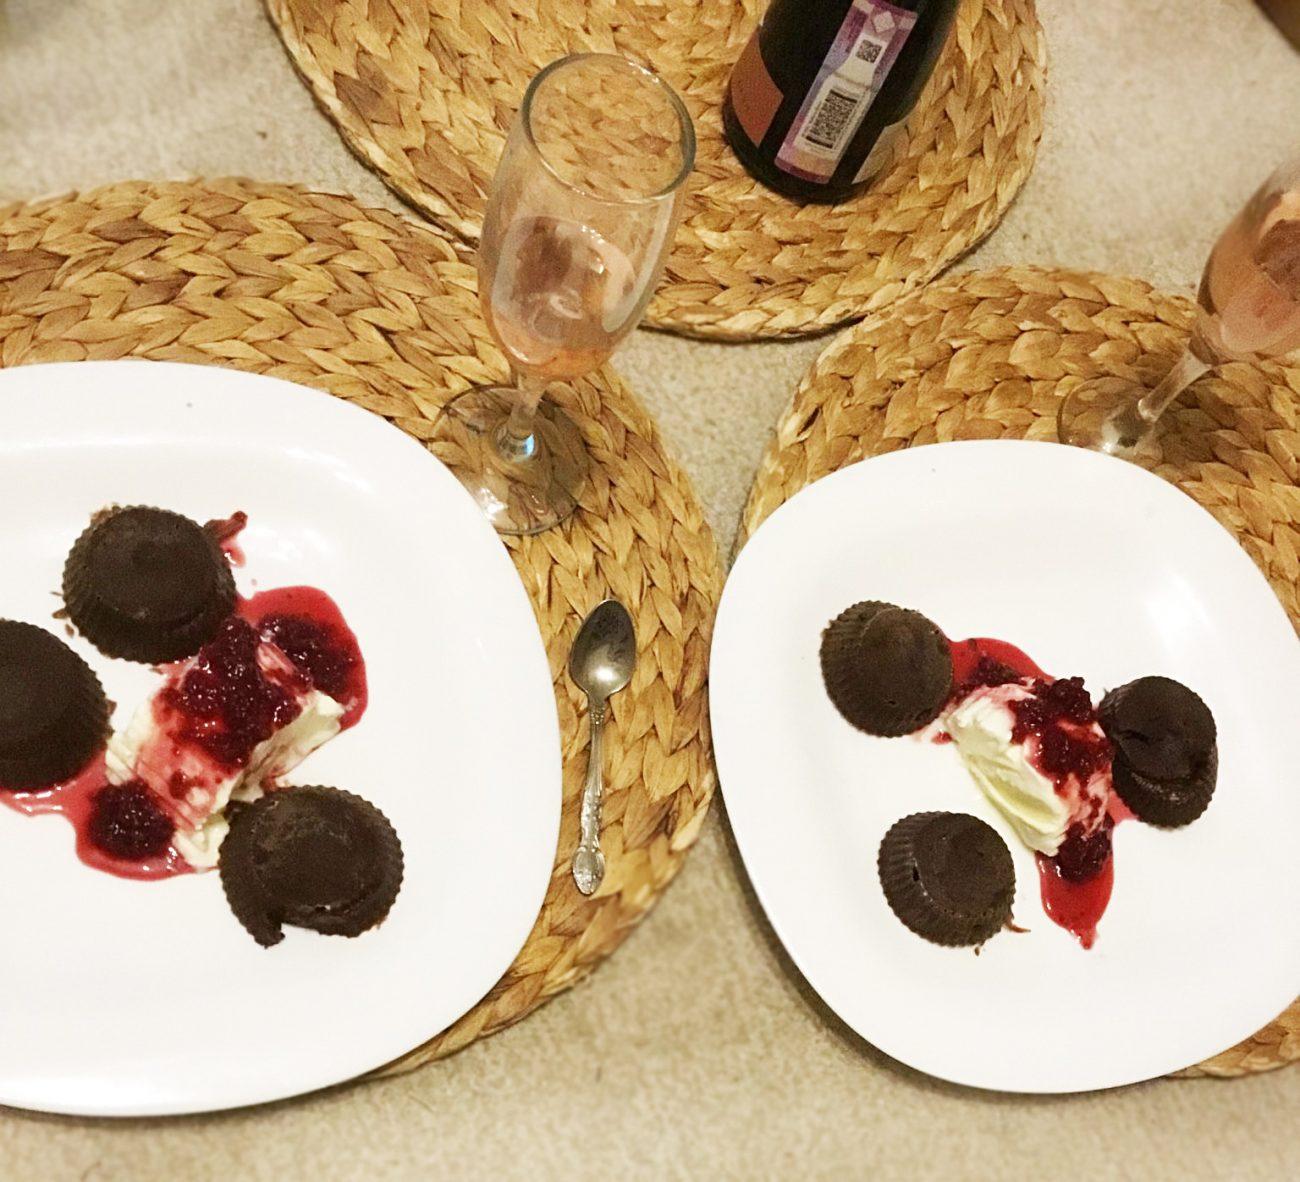 Шоколадные фонданы (кексы)